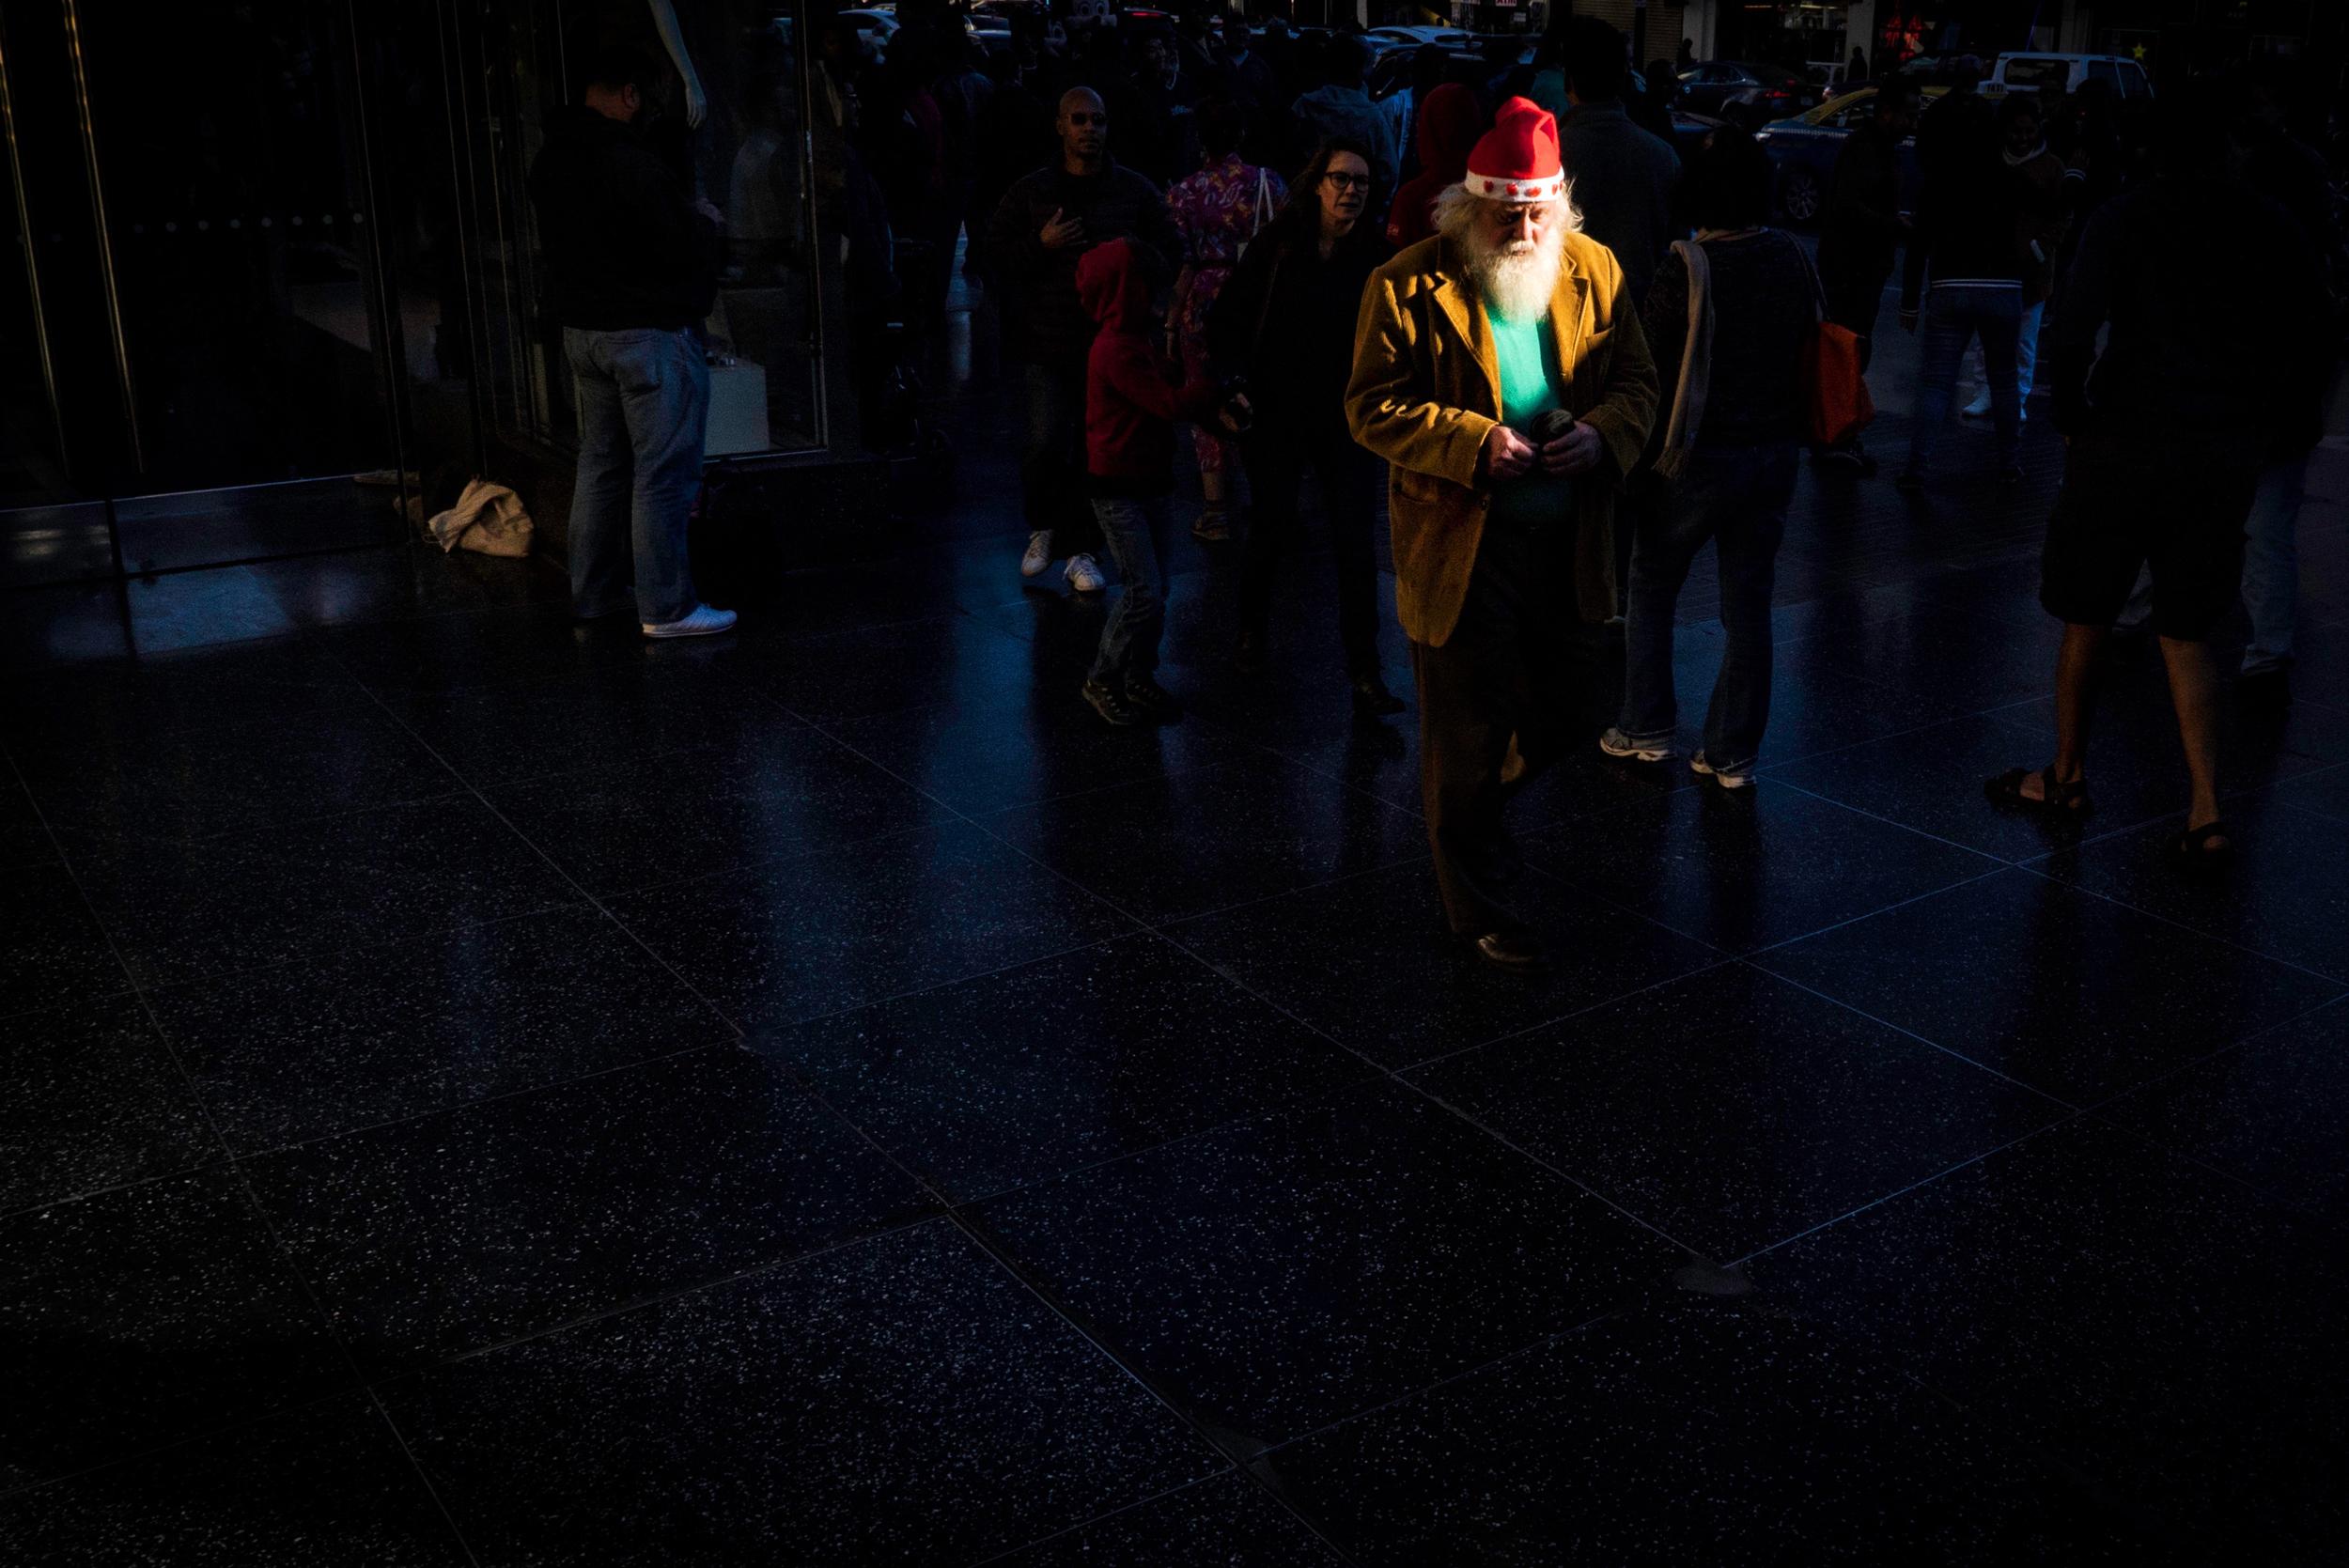 santa-claus-homeless-walking-down-hollywood-blvd.jpg